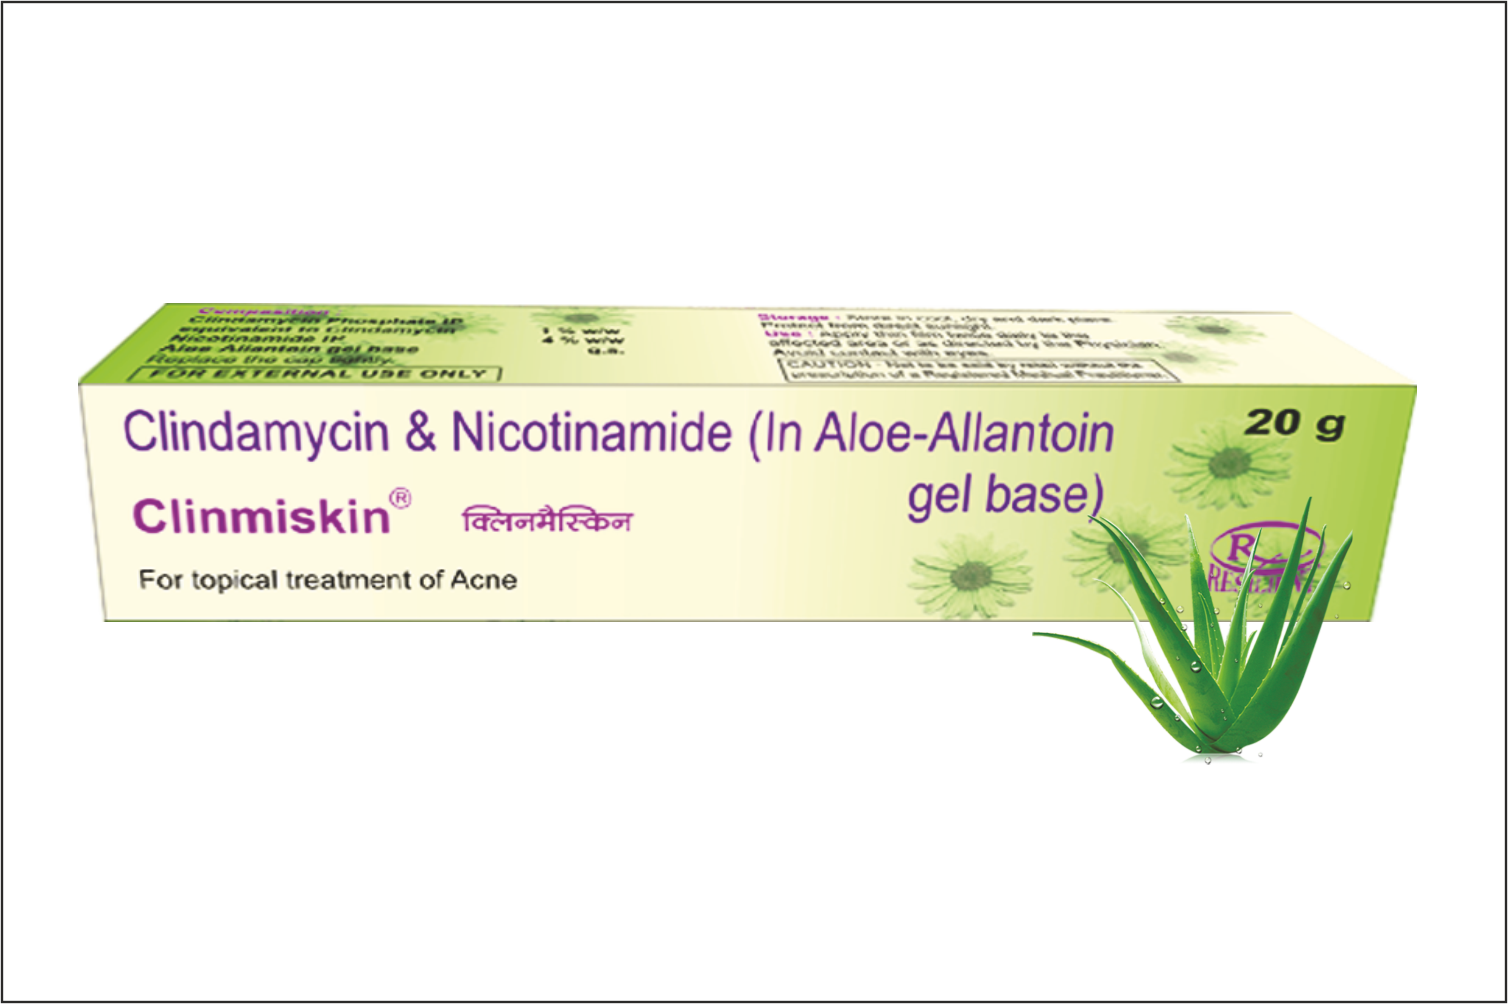 Clinmiskin gel